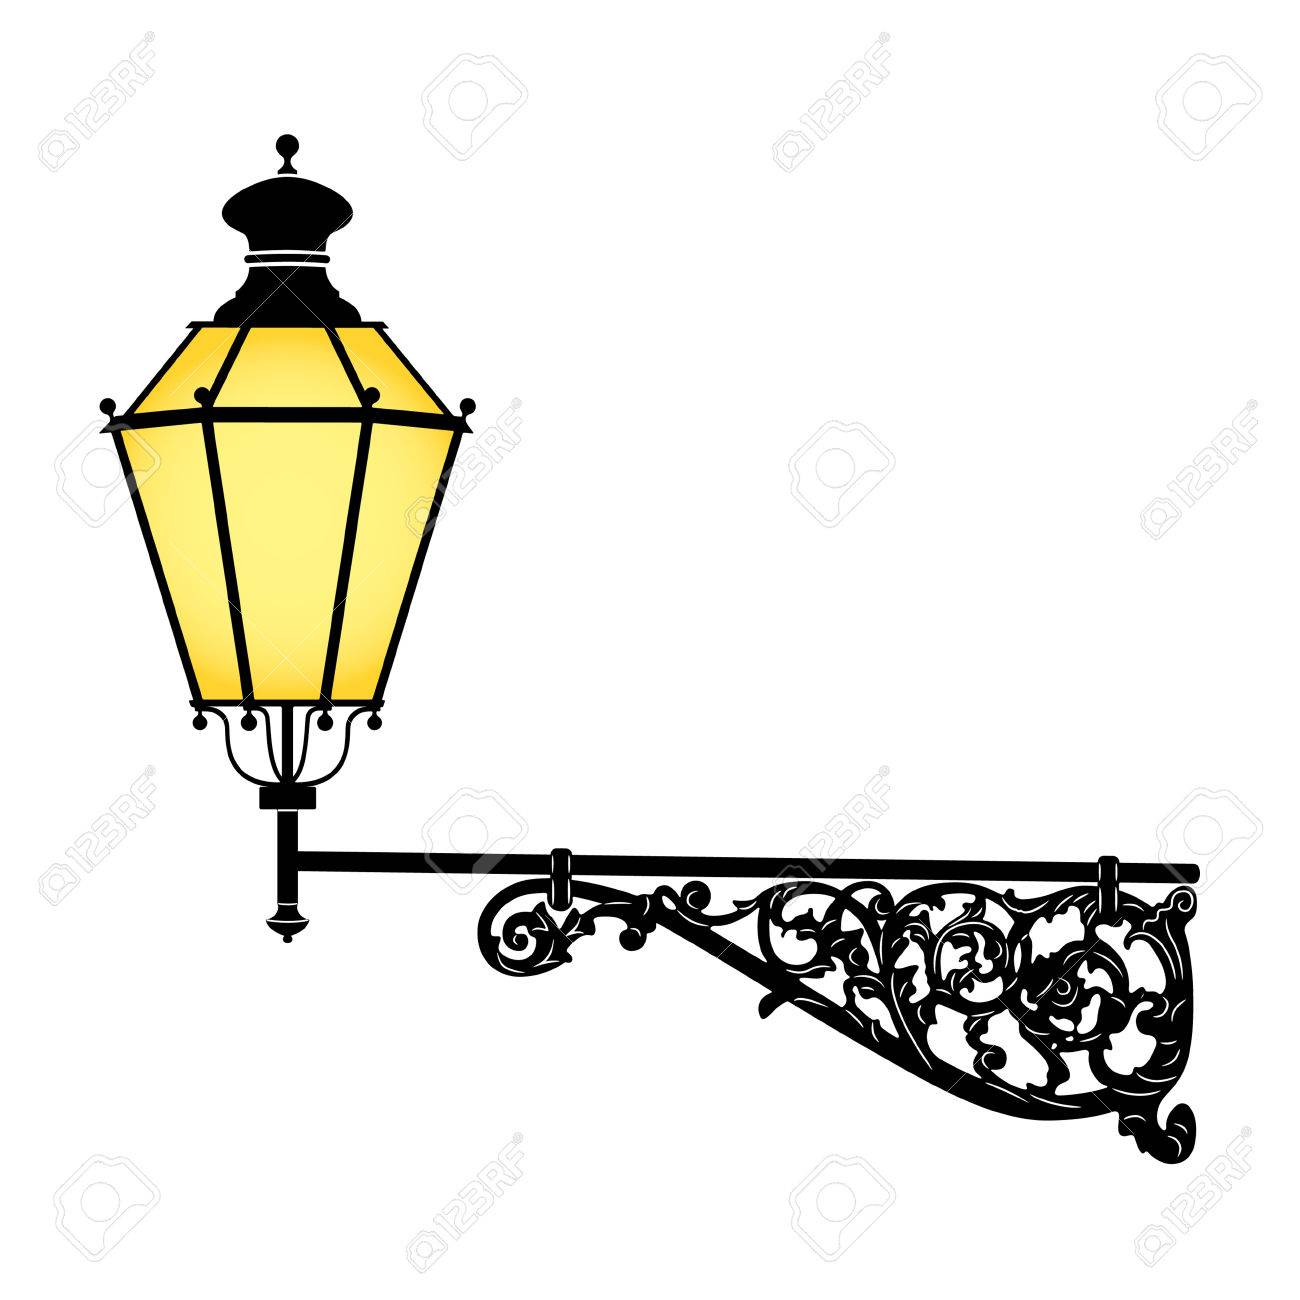 Italian Forged Iron Elegant Street Lamp Royalty Free Cliparts ...